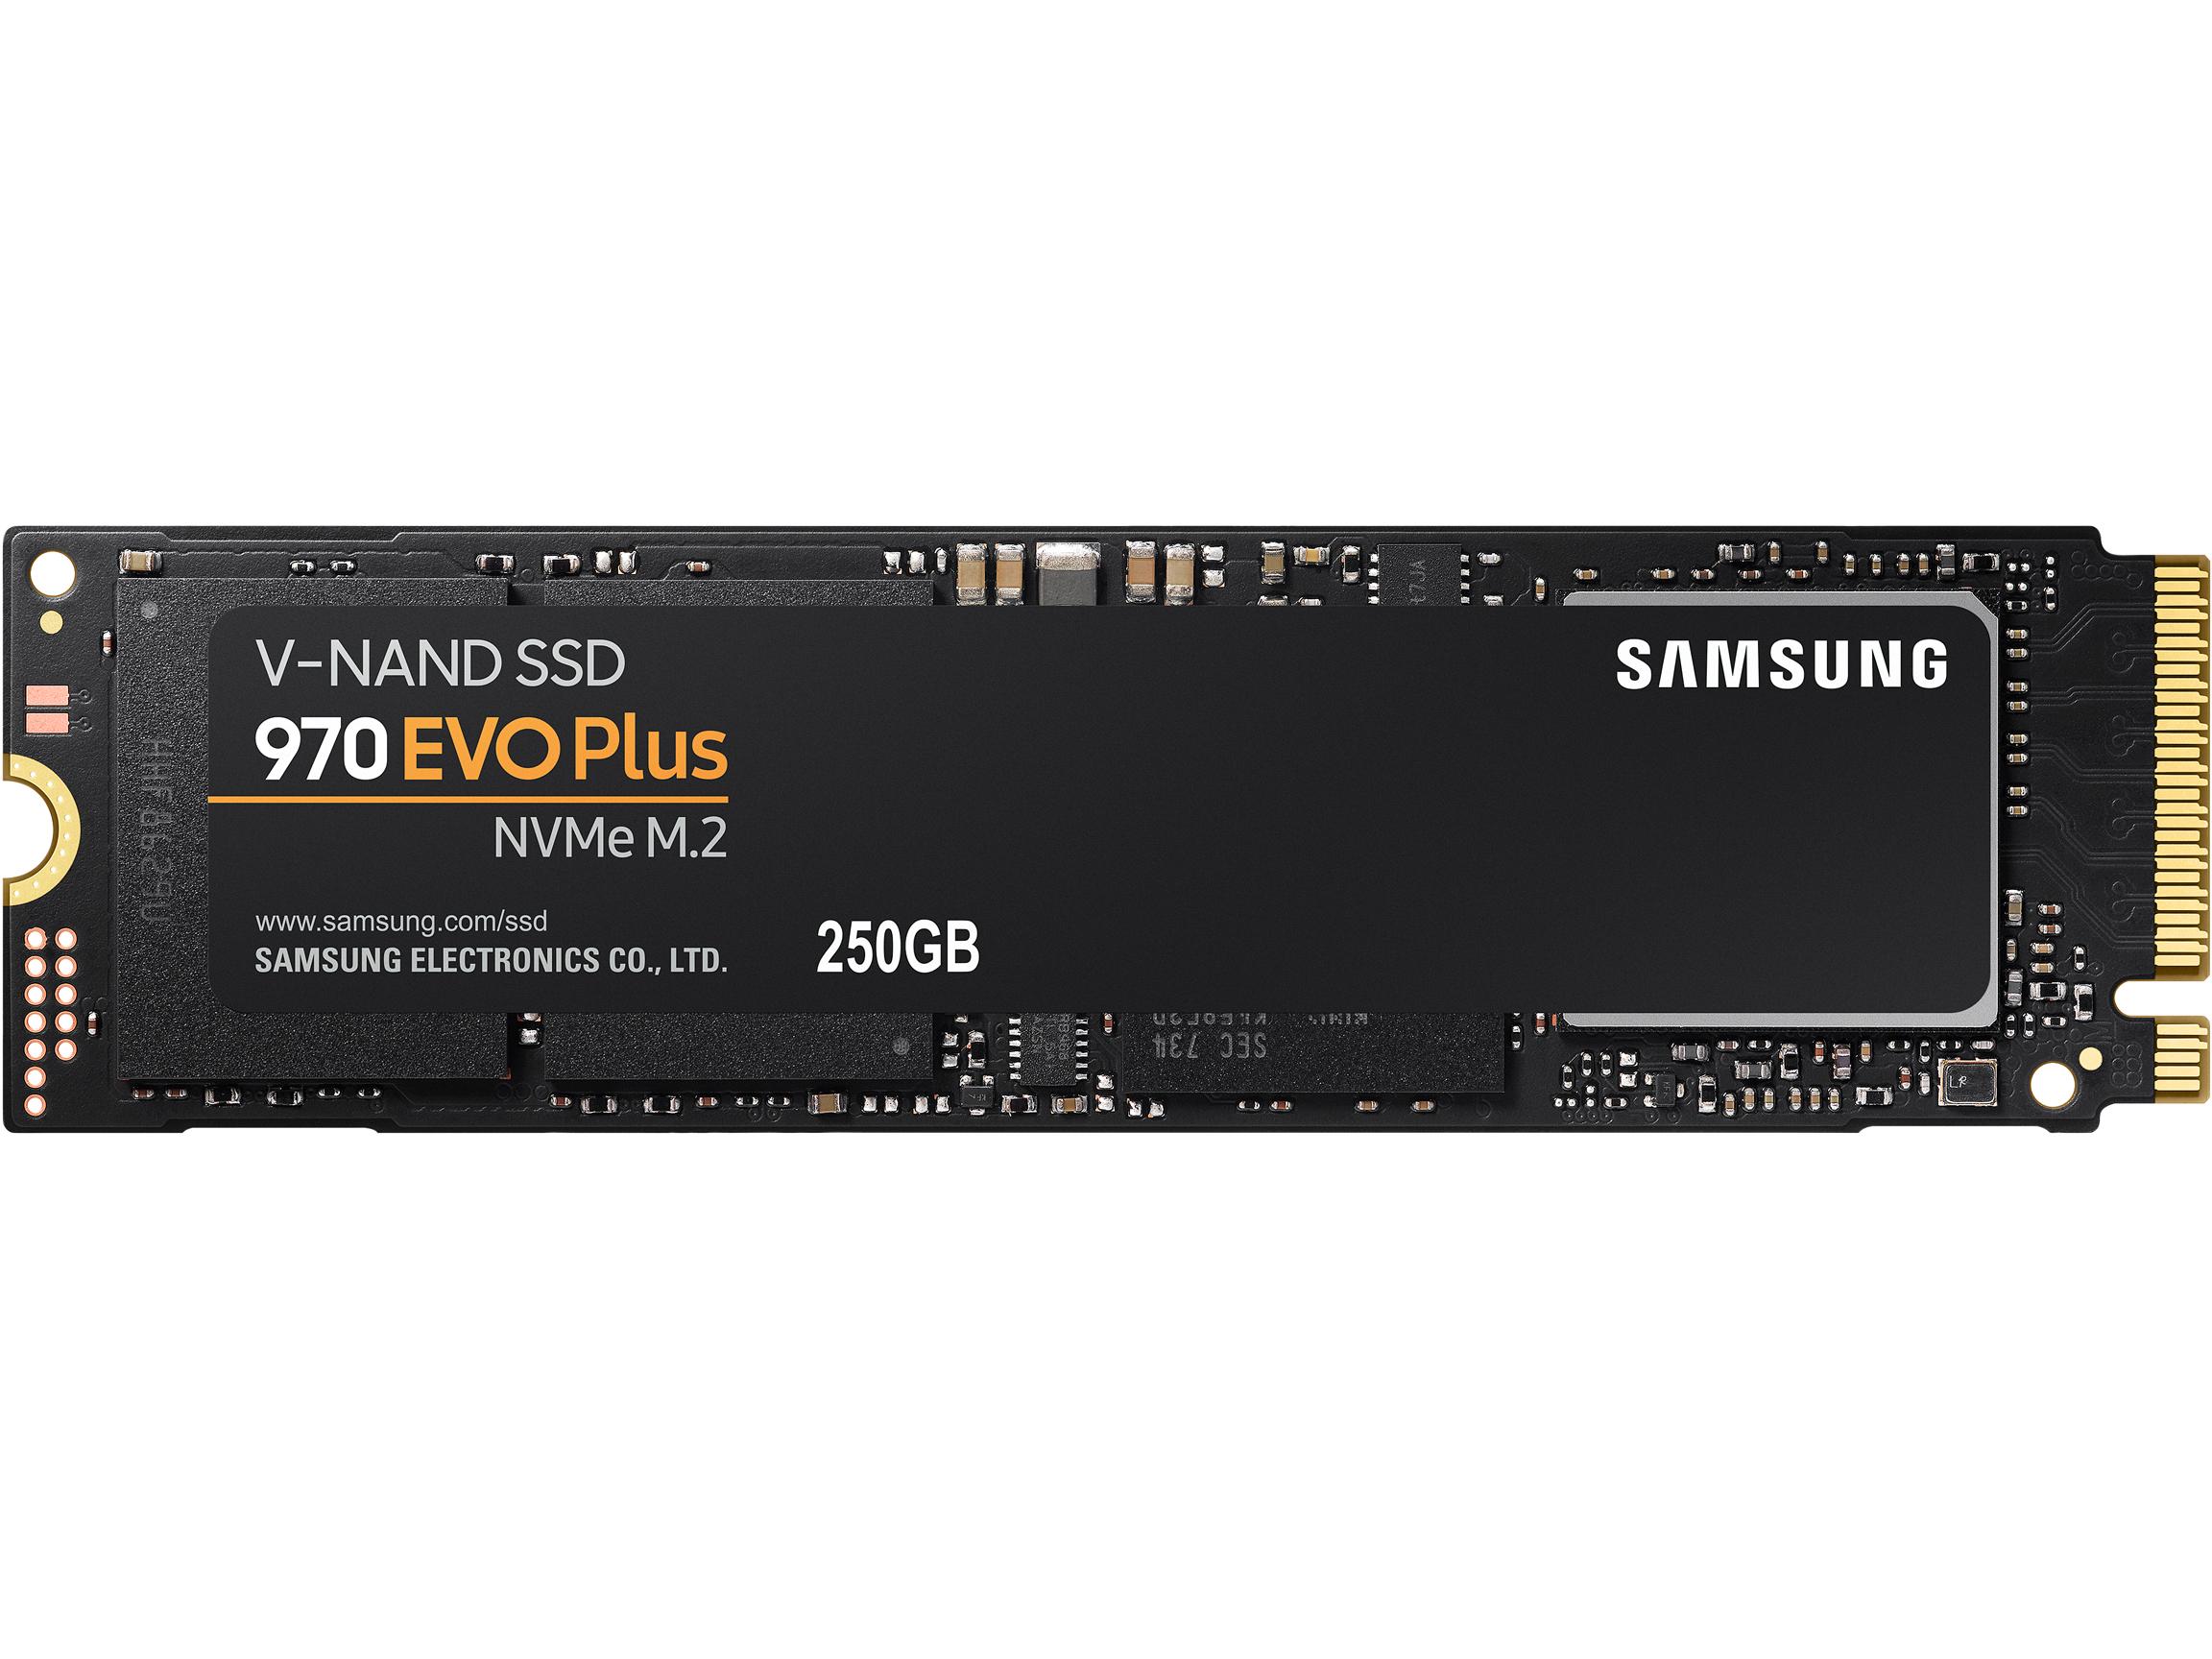 SAMSUNG 970 EVO PLUS M.2 2280 250GB PCIe Gen 3.0 x4, NVMe V-NAND Internal Solid State Drive (SSD) MZ-V7S250B/AM